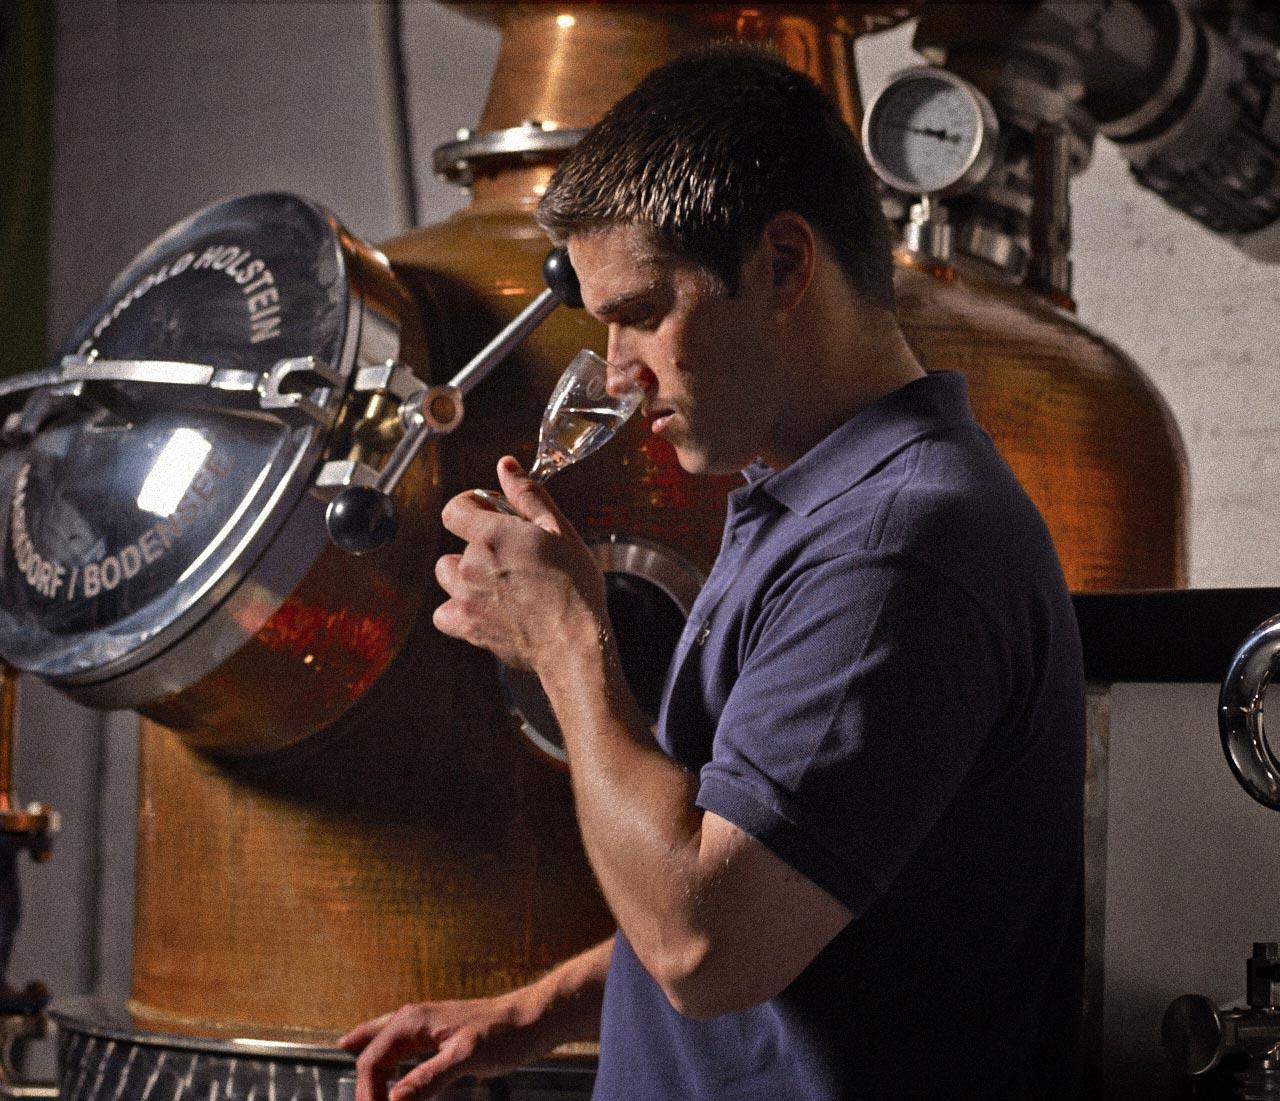 Greenhook Ginsmiths Steven DeAngelo Still | greenhookgin.com